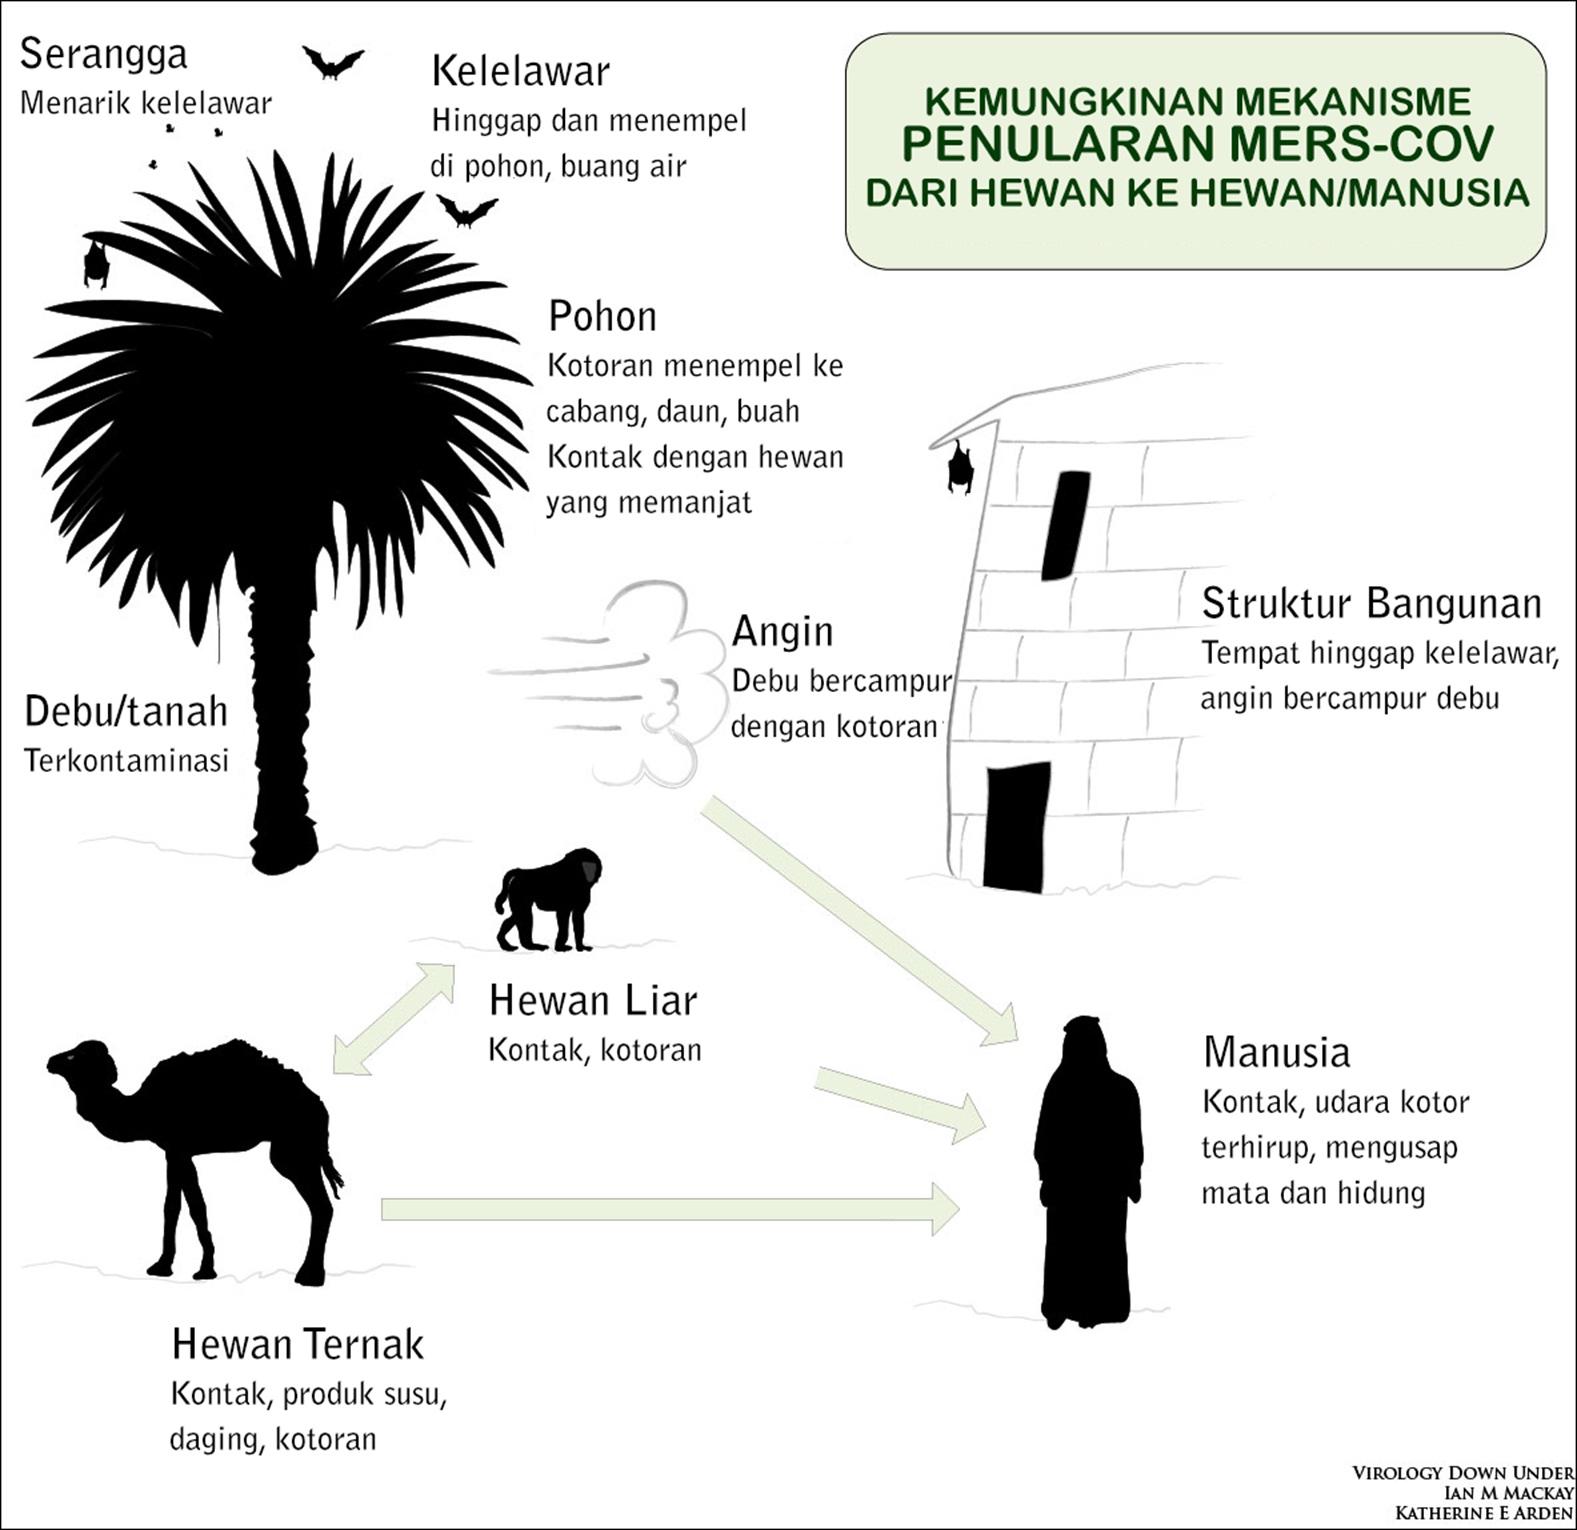 Kemungkinan mekanisme penularan MERS-CoV yang melibatkan hewan ternak dan hewan liar hingga mencapai tubuh manusia. (Sumber: Virology Down Under, http://virologydownunder.blogspot.com/)